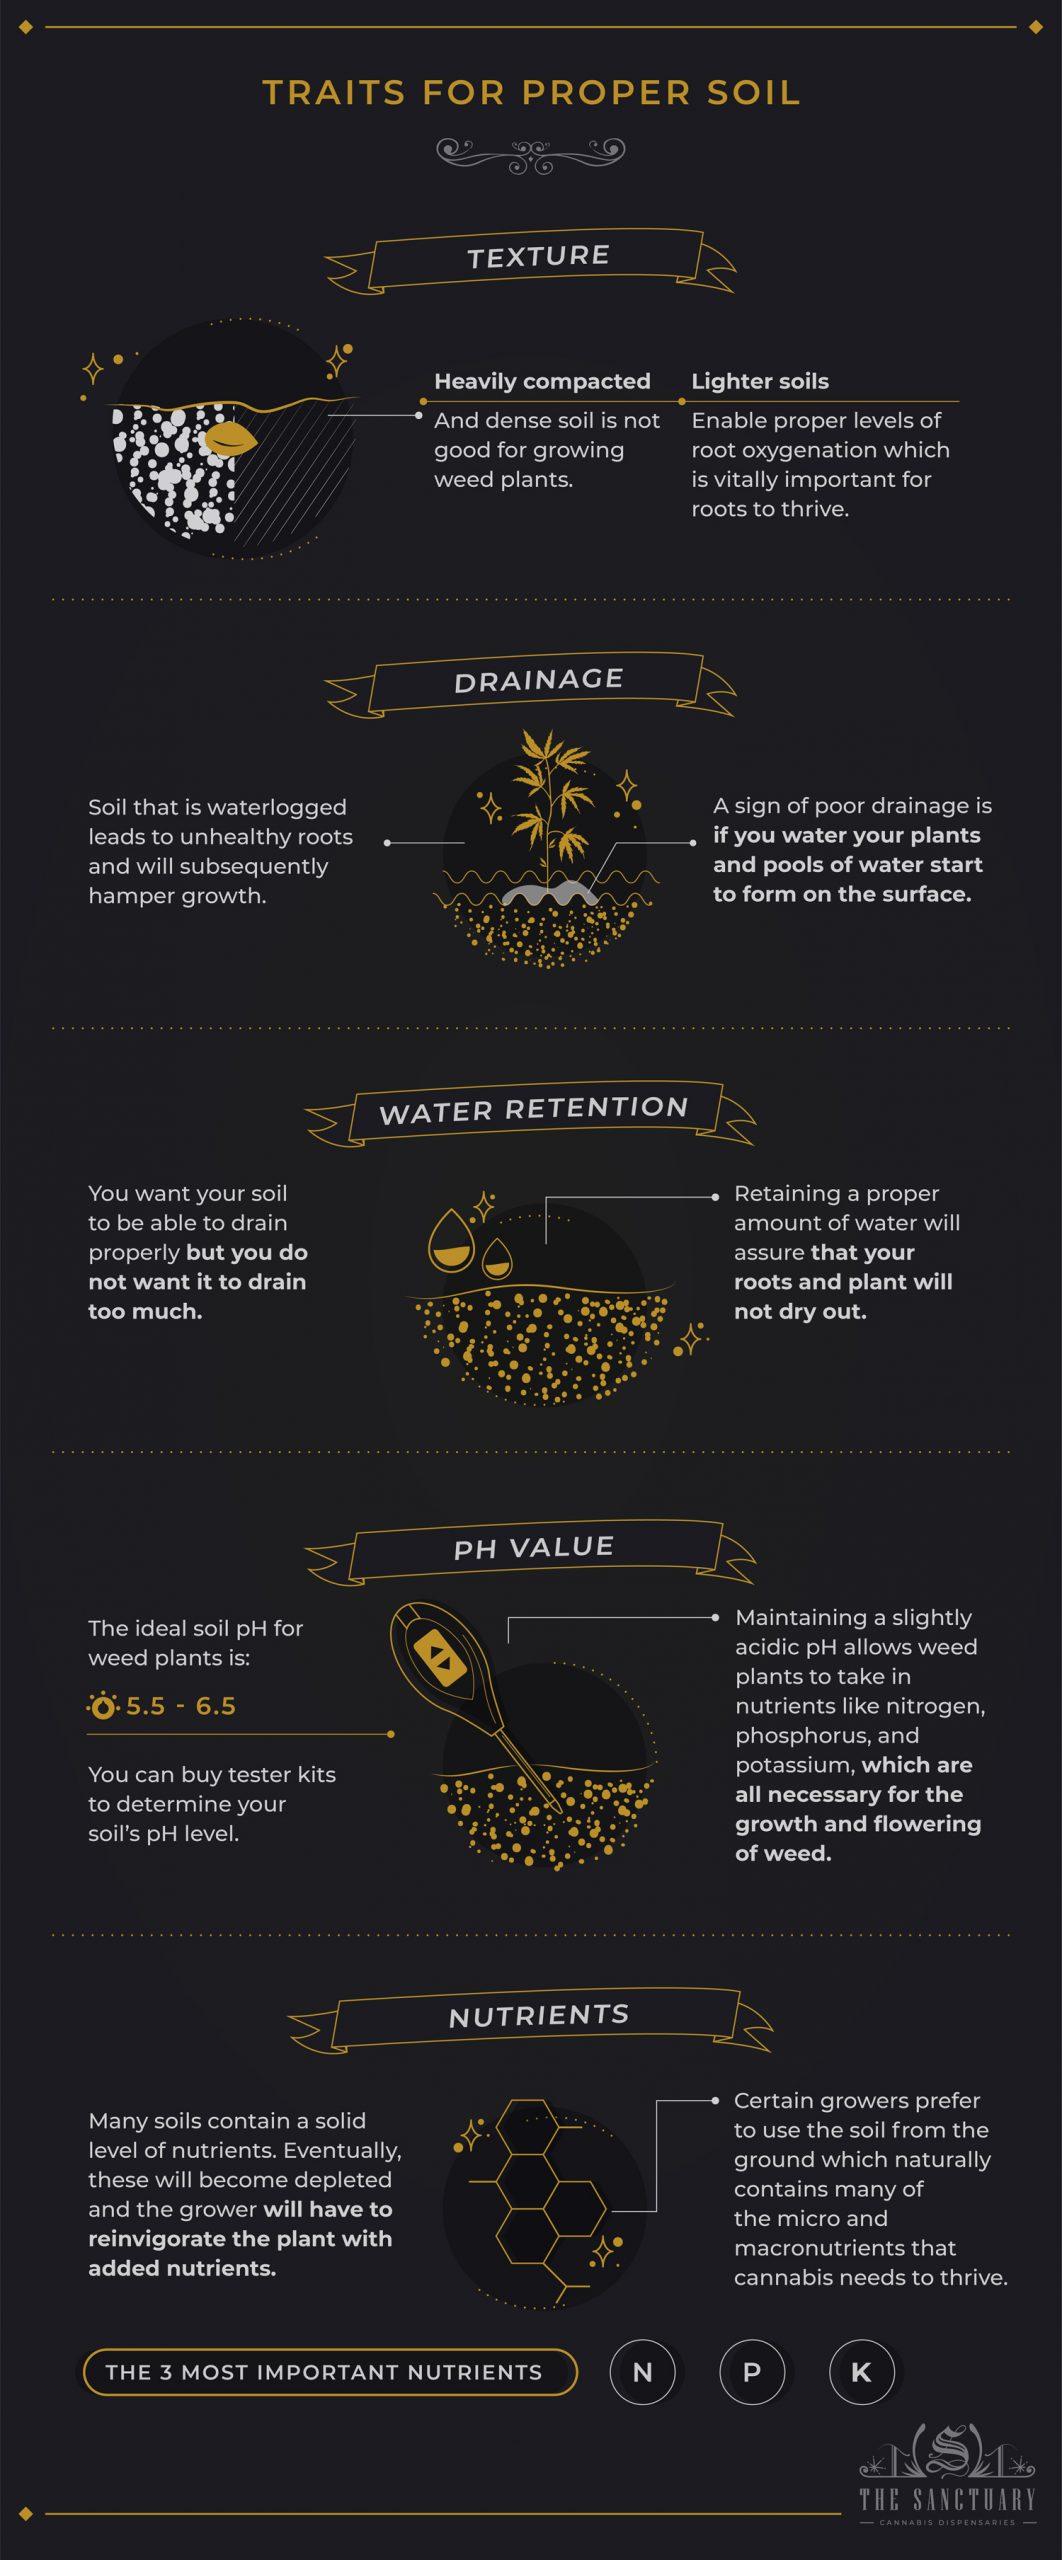 Traits for proper soil